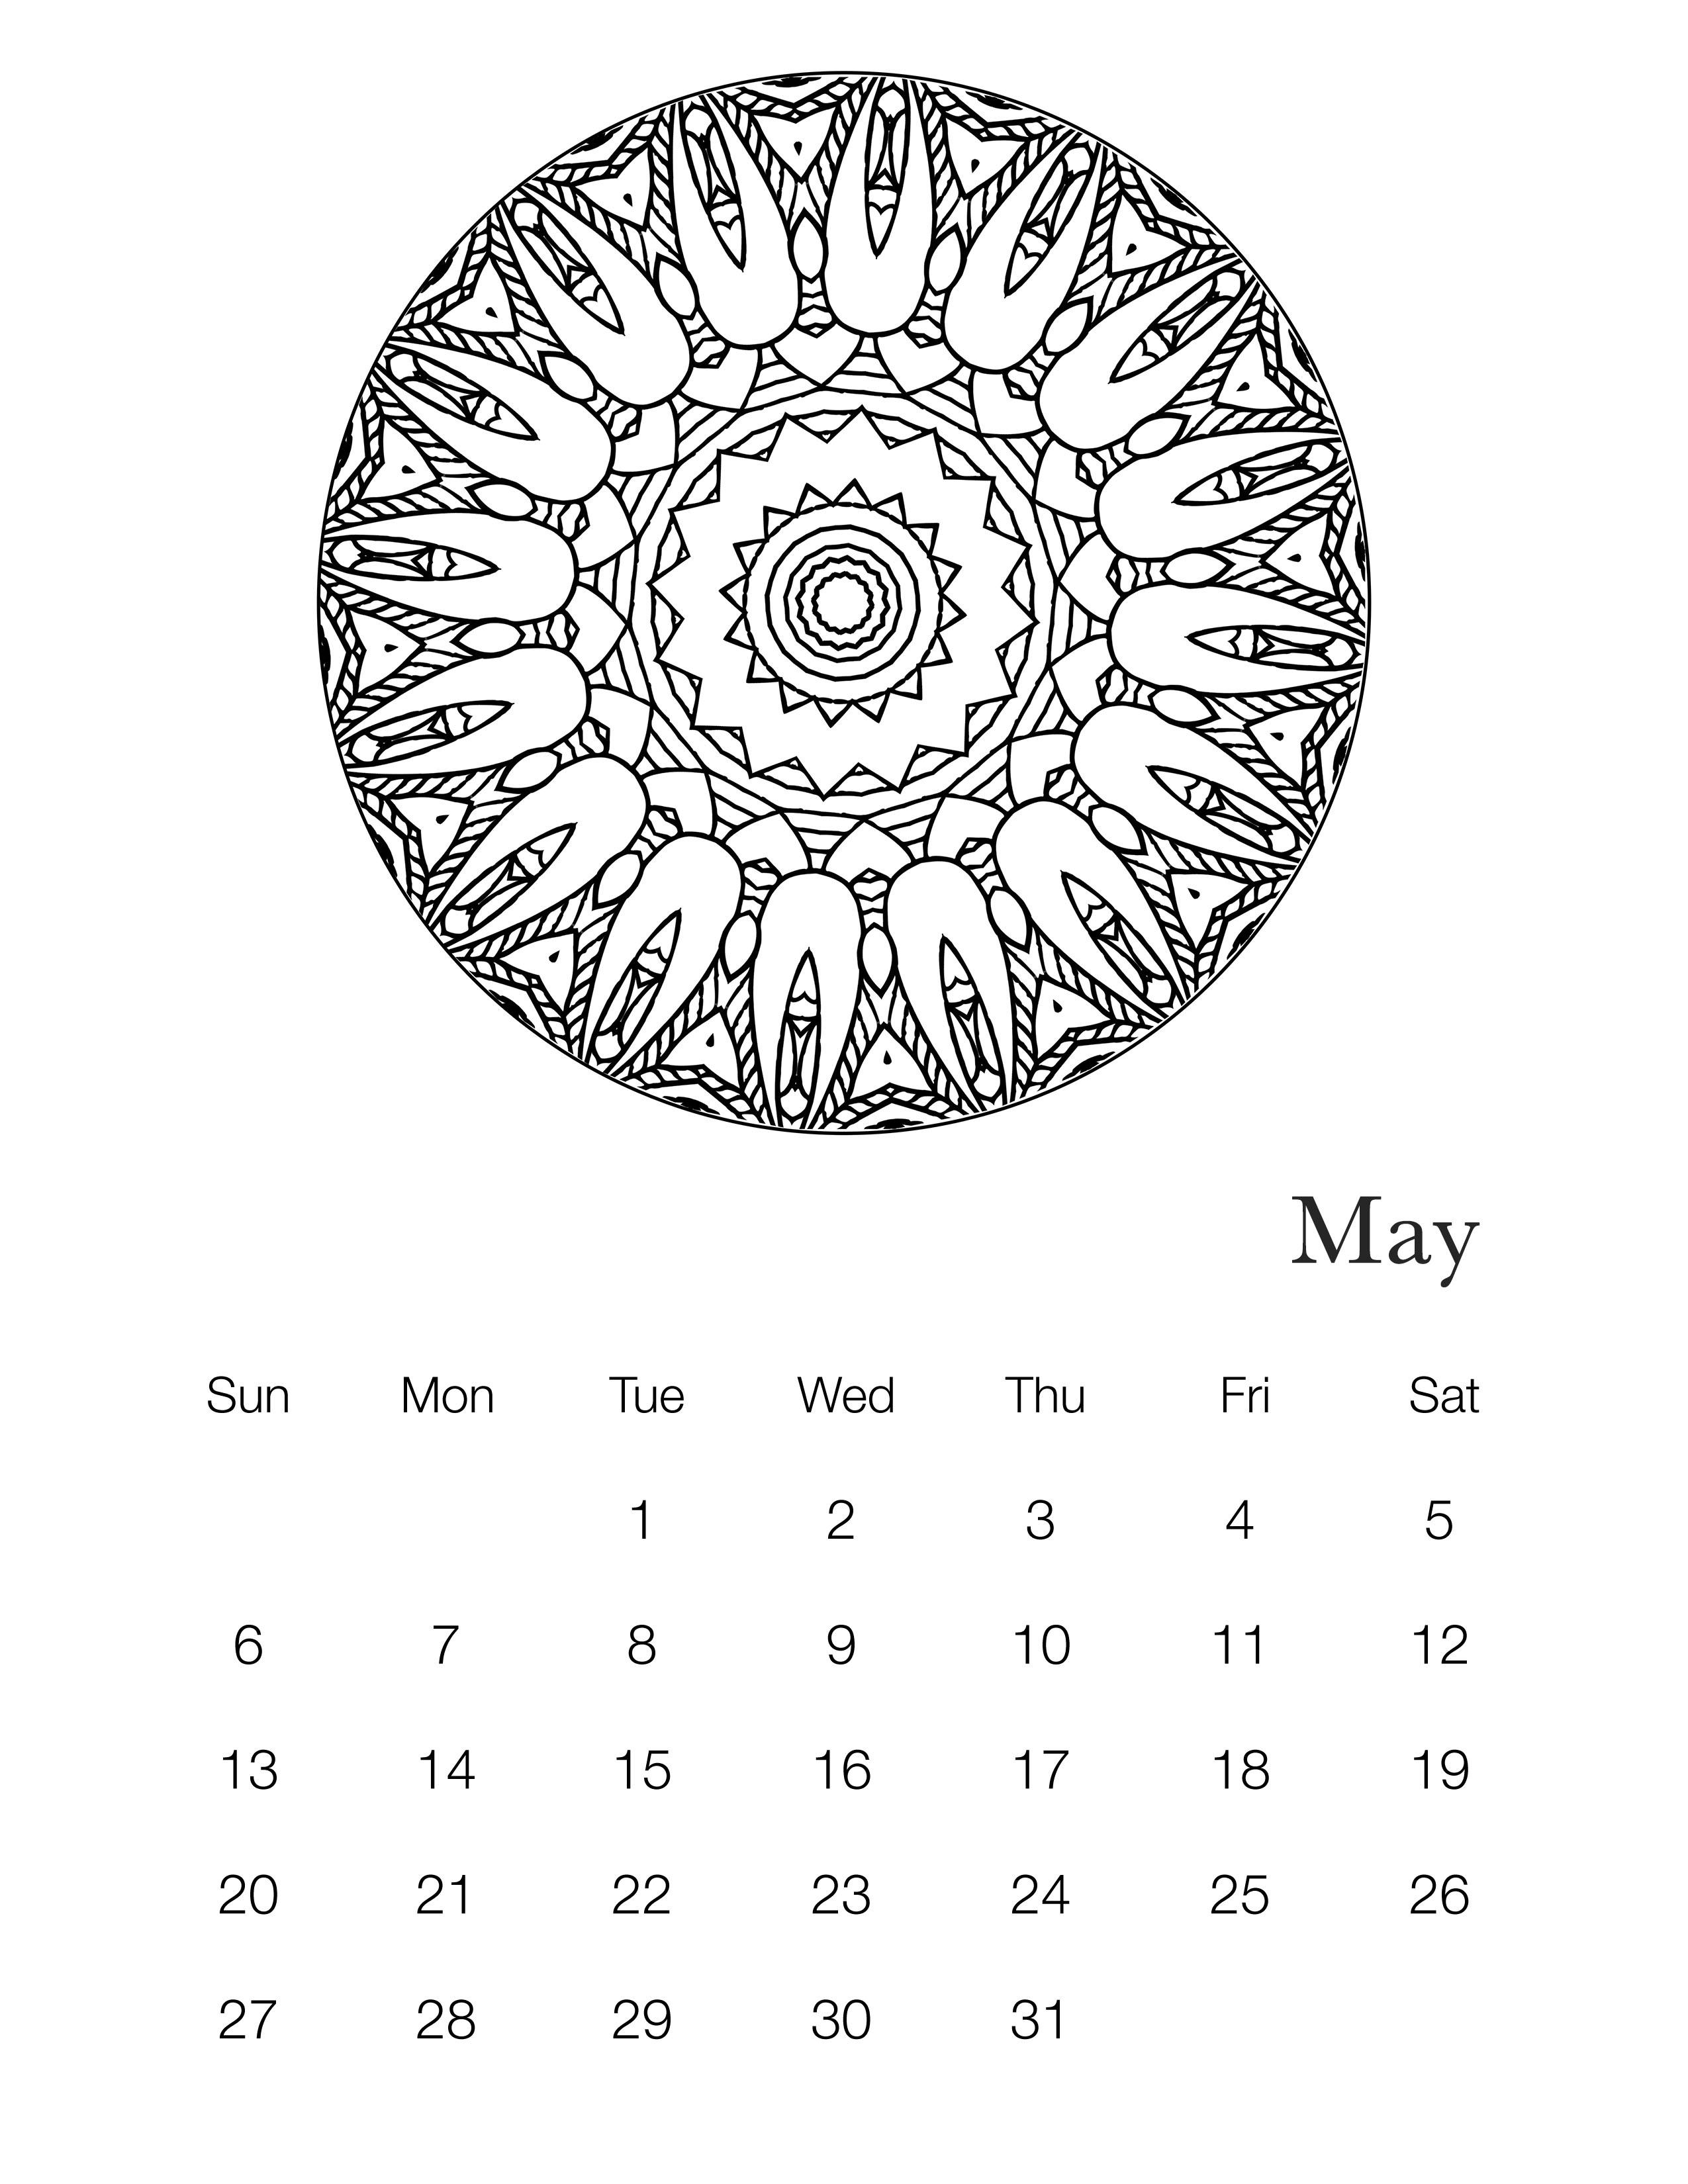 Free Printable 2018 Mandala Coloring Book Calendar - The Cottage Market